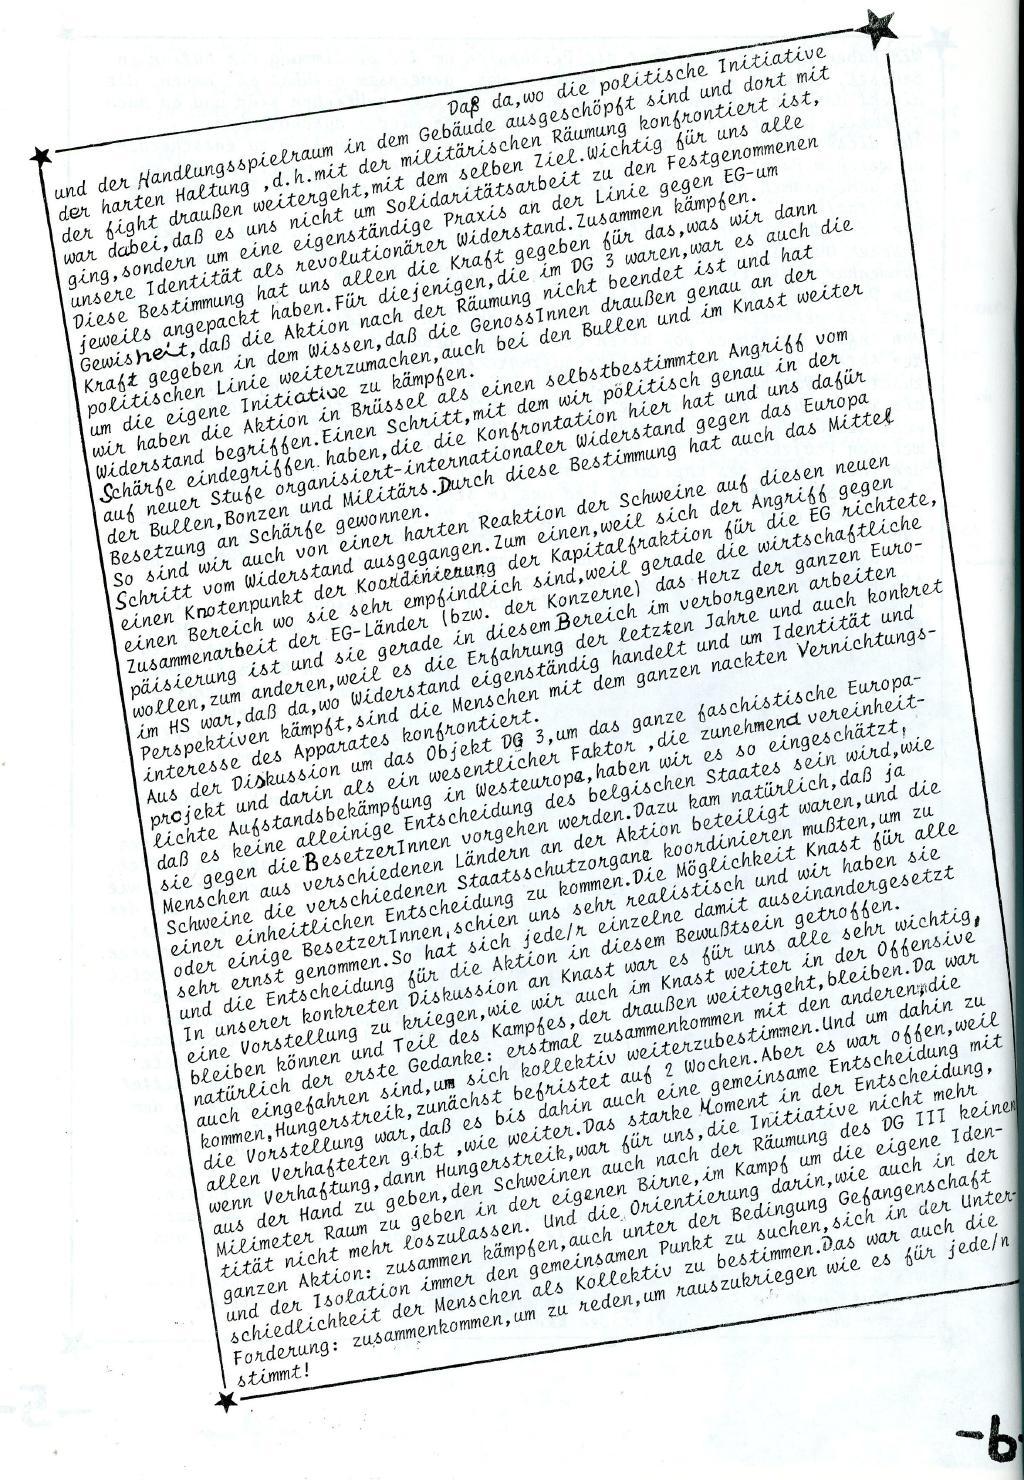 Belgien_Doku_Besetzung_EG_Kommission_1989_008